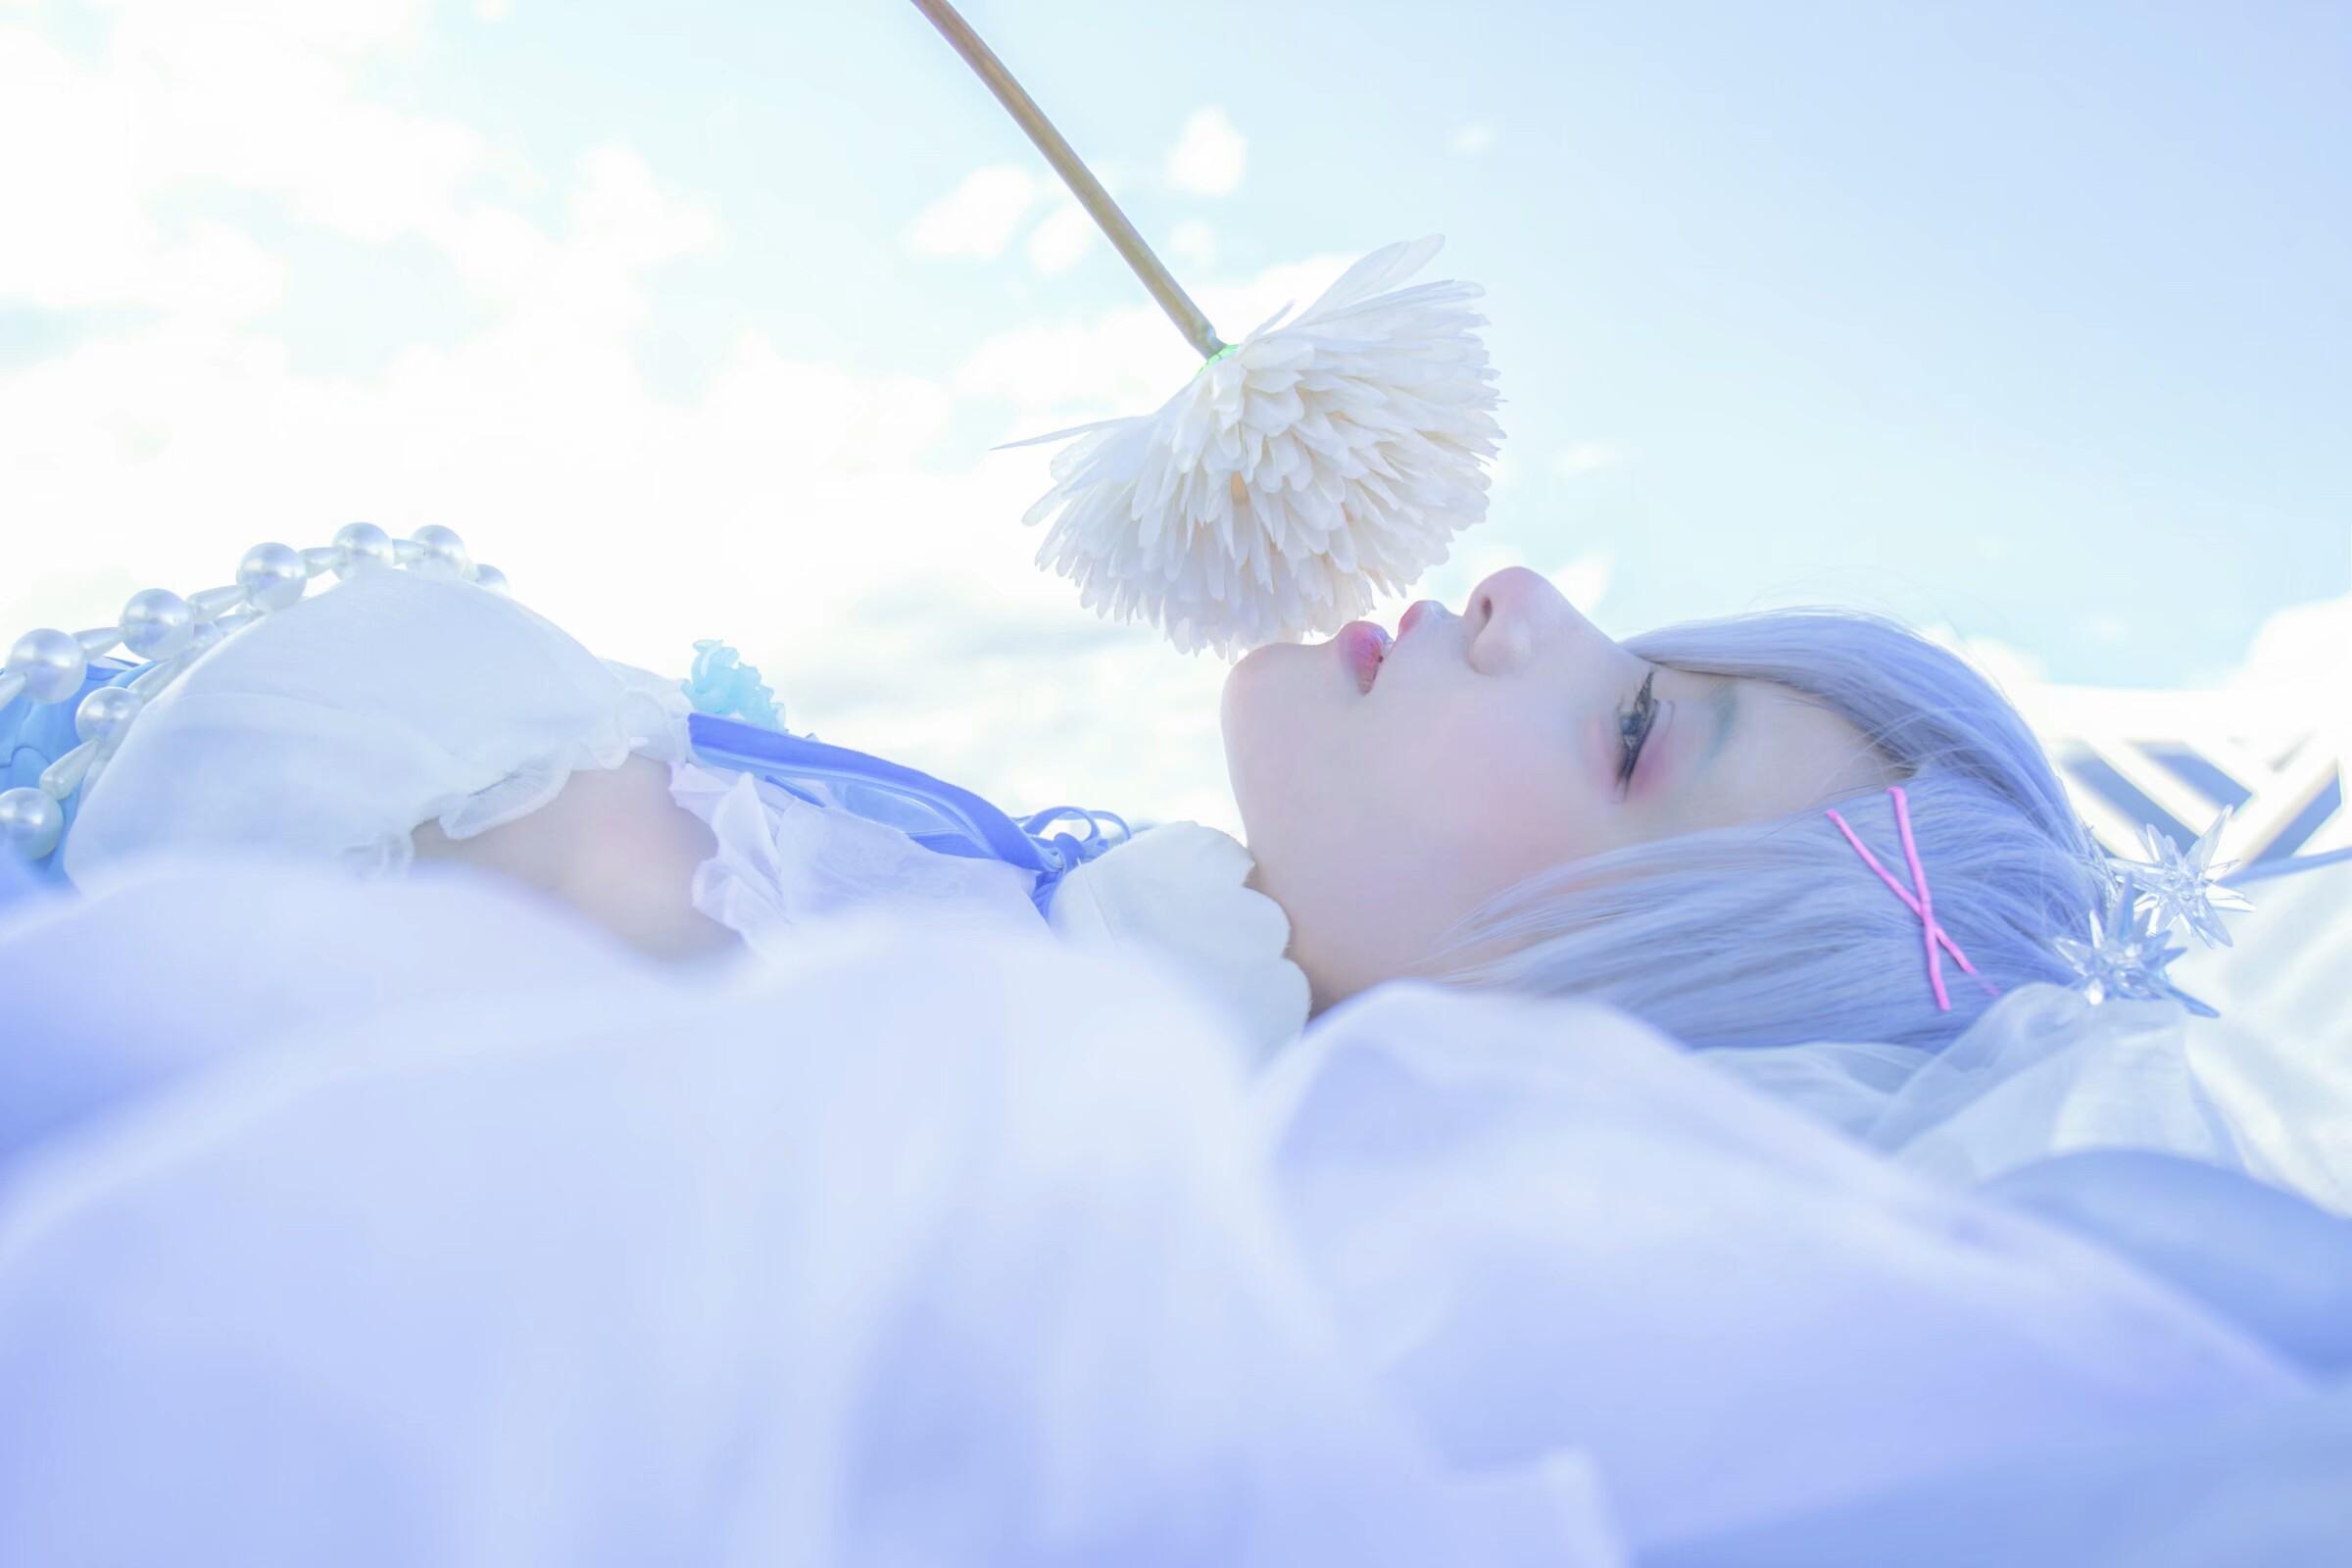 《RE:从零开始的异世界生活》十一cosplay【CN:咸鱼爱扯淡】-第6张